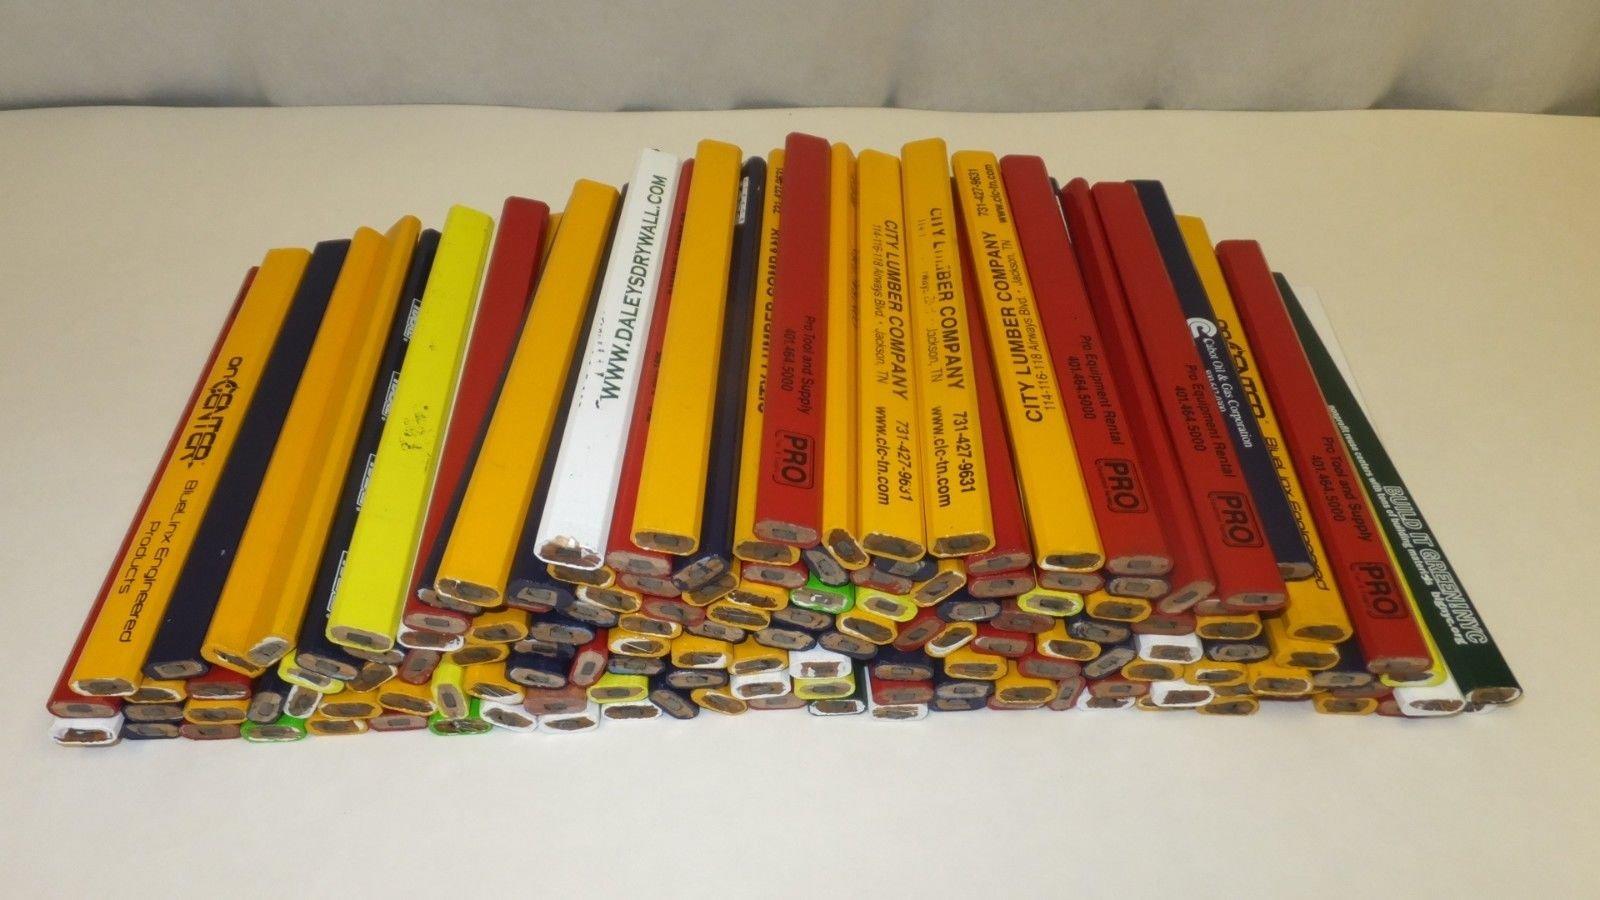 144 Lot Misprint Woodcase Carpenter Pencils, #2 Lead, Bulk Wholesale Lot by Closeouts For Less